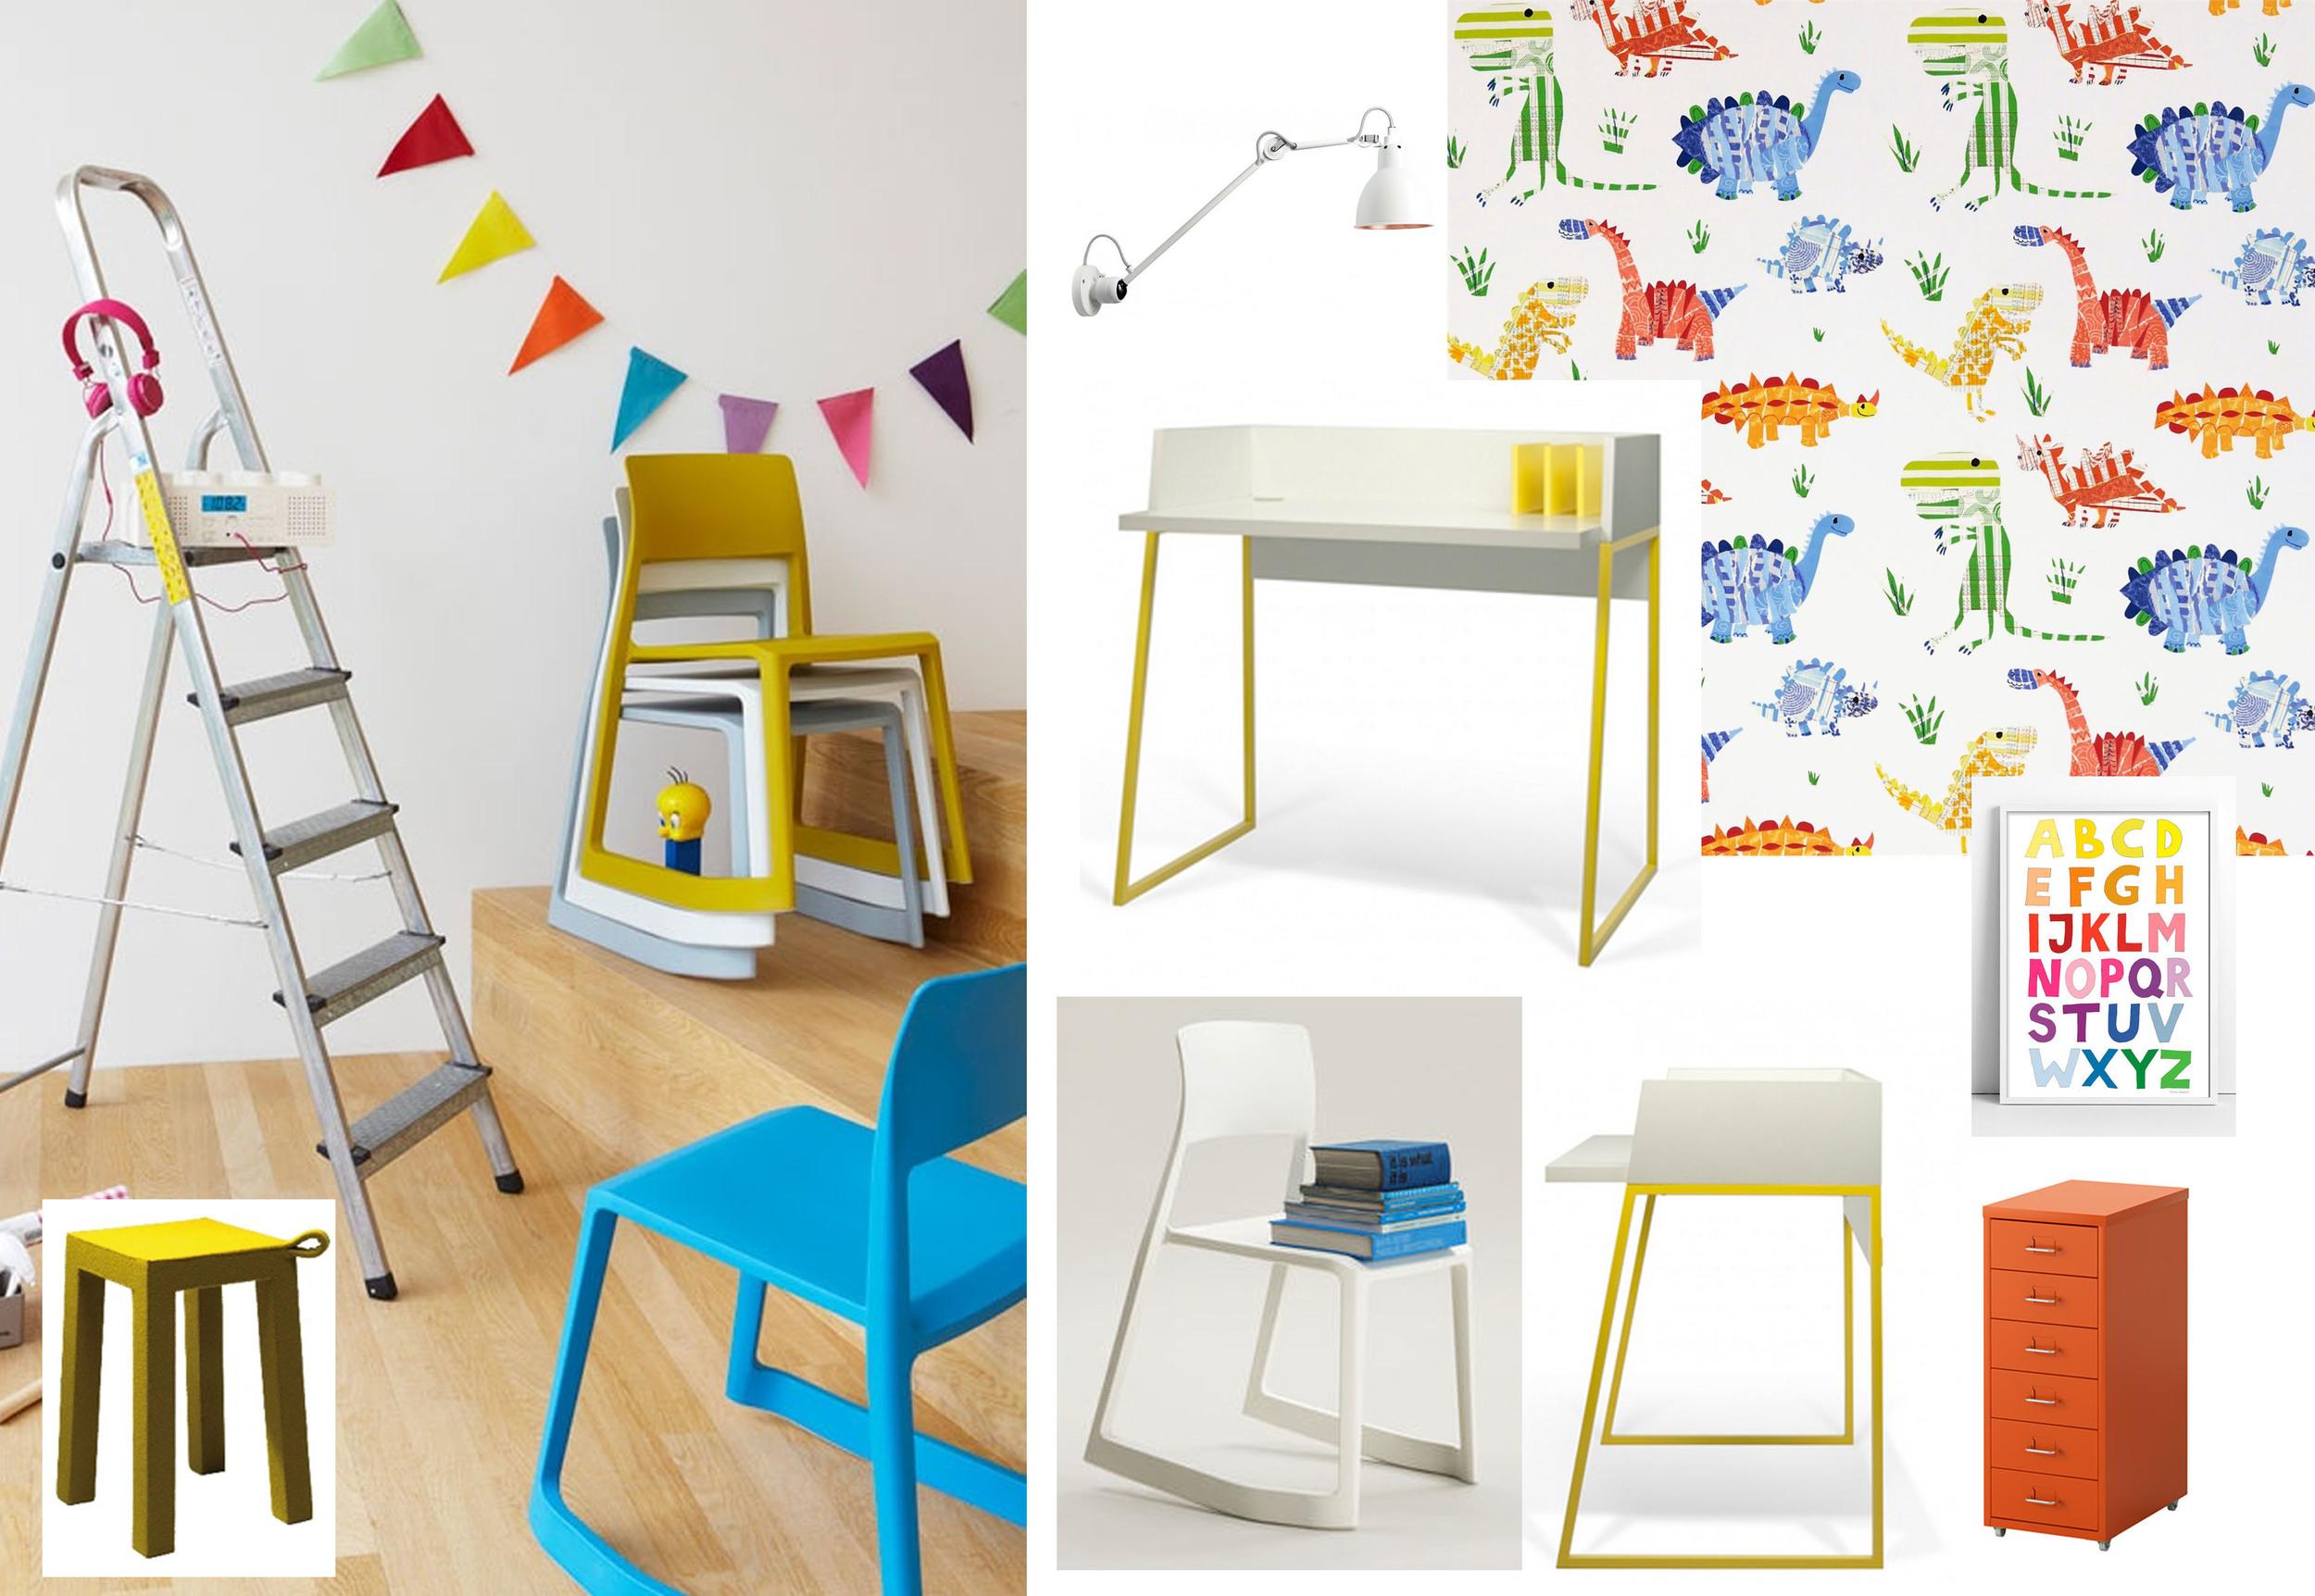 Tip Ton Chair  Vitra  - Volga desk  Temahome  - stool Handle  Temahome  - Drawer unit  Ikea  - wallpaper Jolly Jurassic  Harlequin  - ABC poster  Tellkiddo  - wall light  DCW-editions